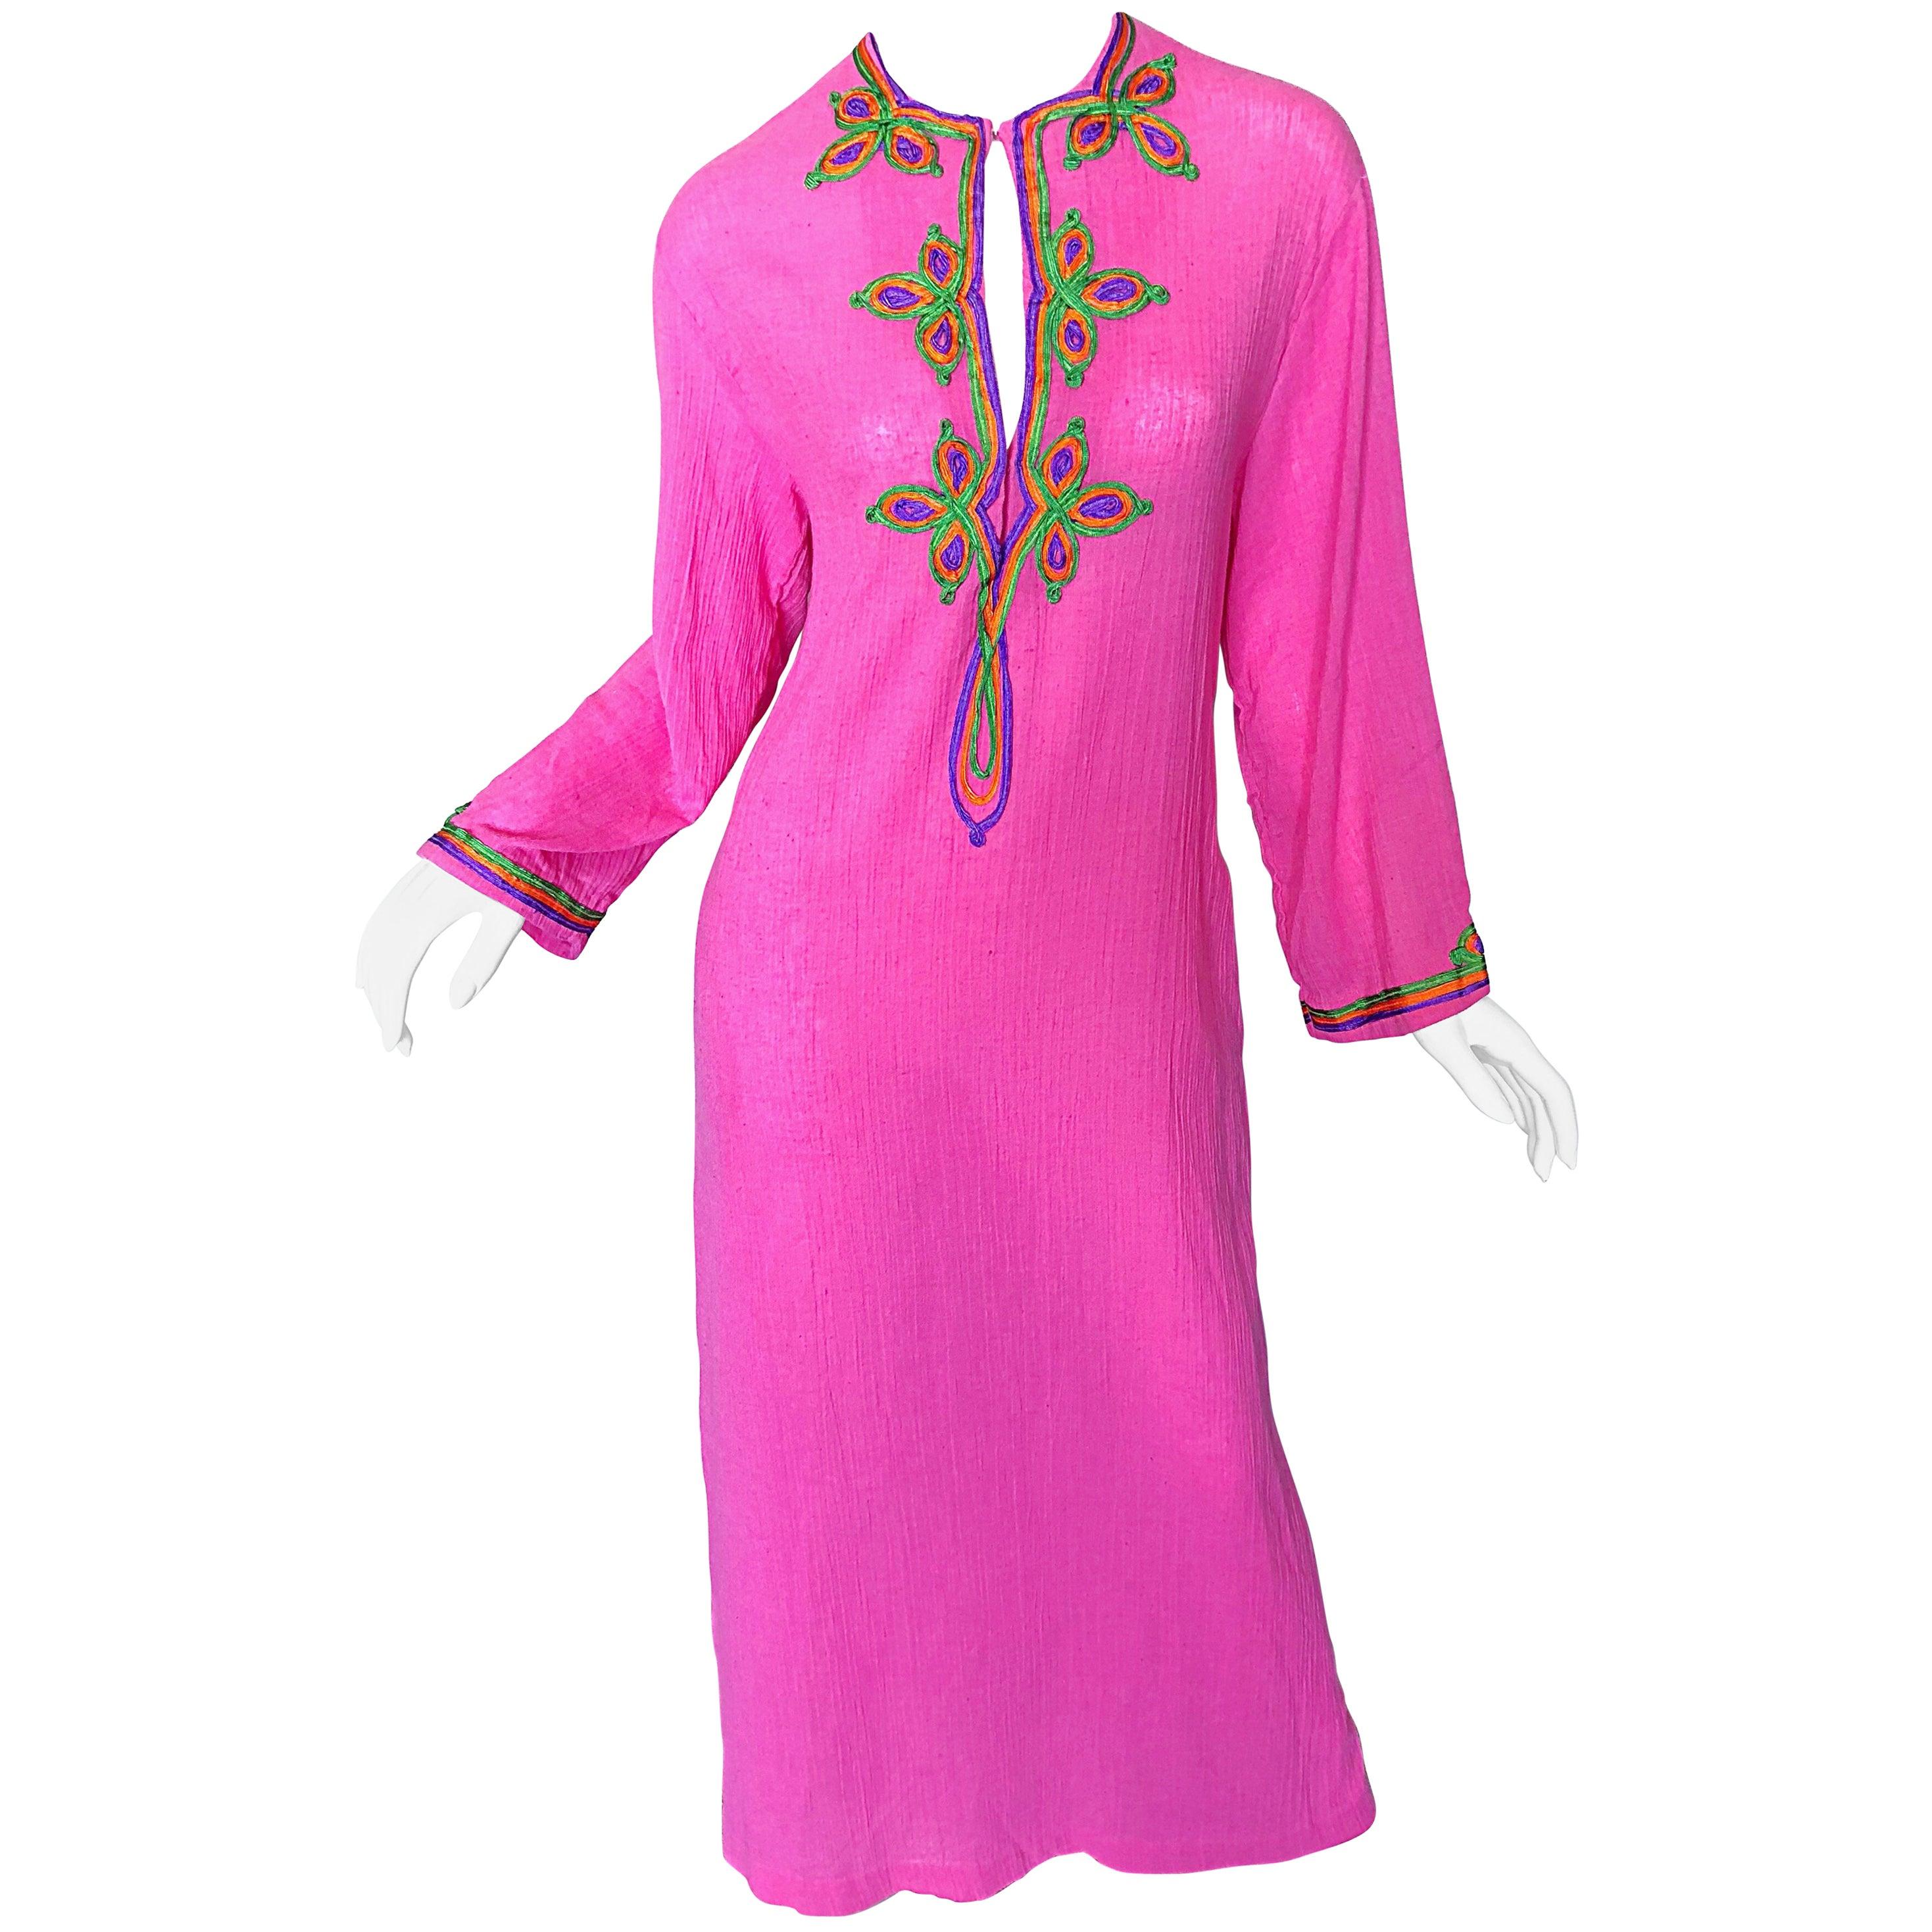 Vintage Christian Dior 1960s Bubblegum Pink Moroccan 60s Caftan Maxi Dress